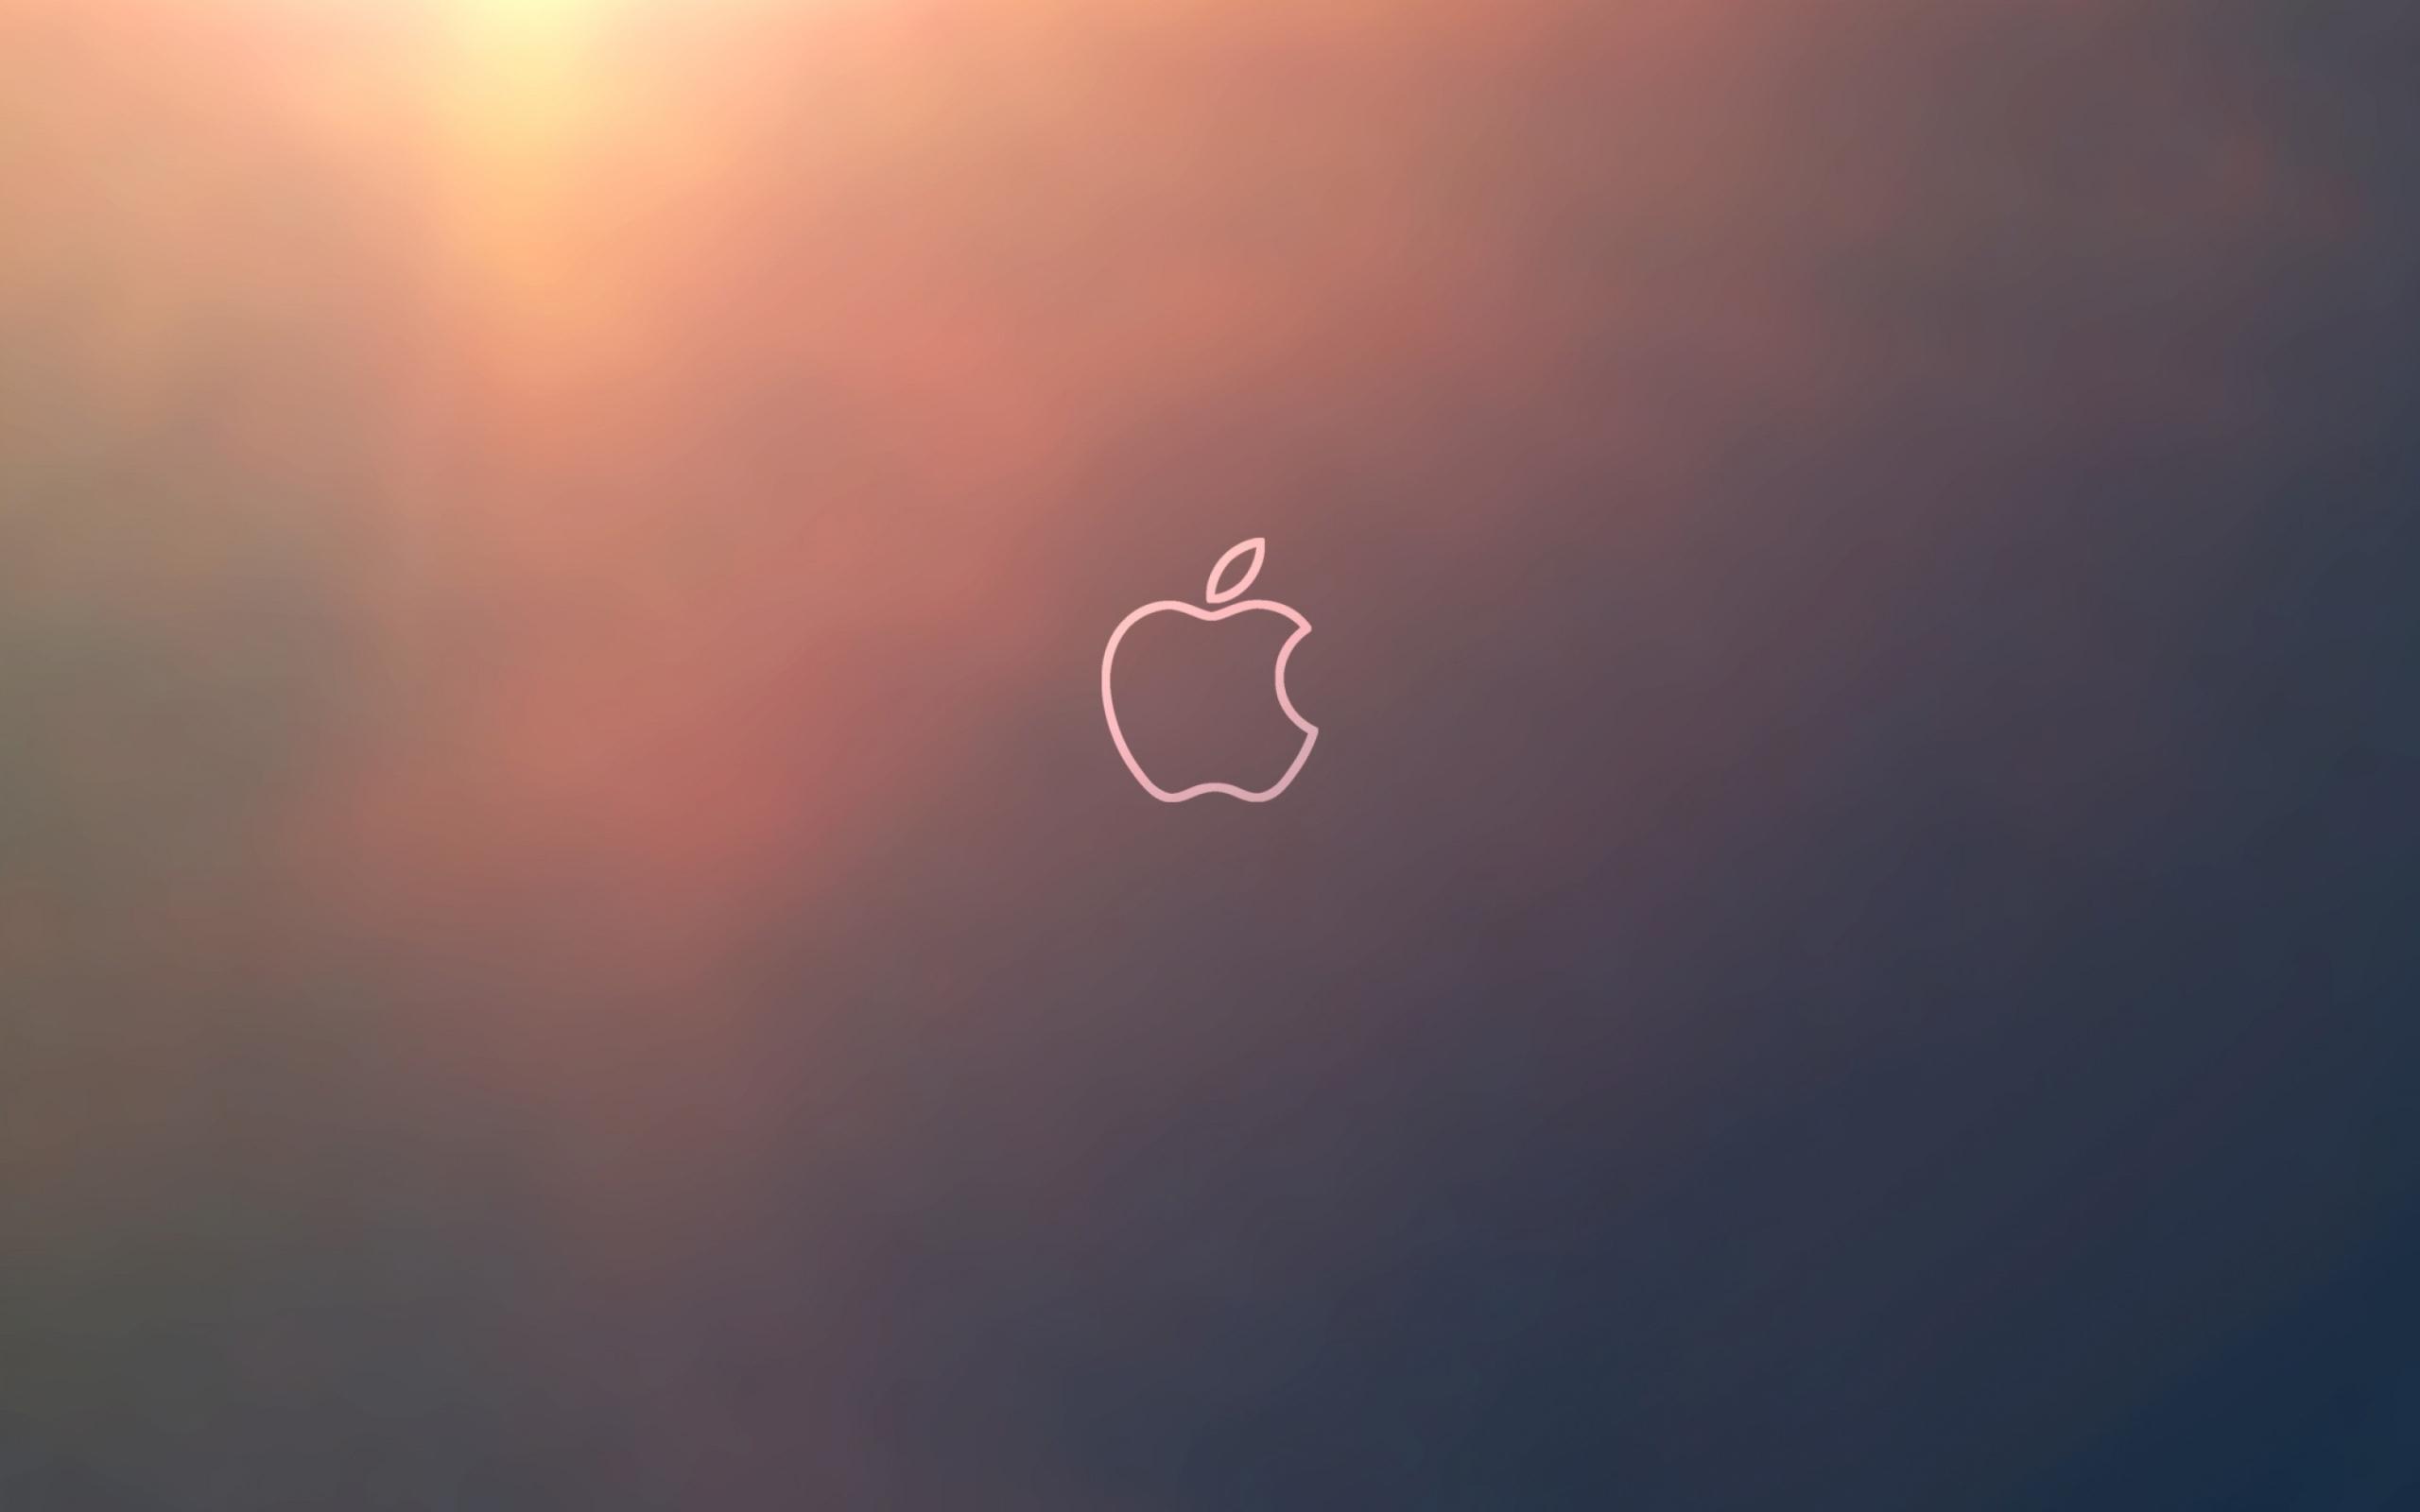 Apple Fluorescence Brand Mac Wallpaper Download Mac Wallpapers 2560x1600